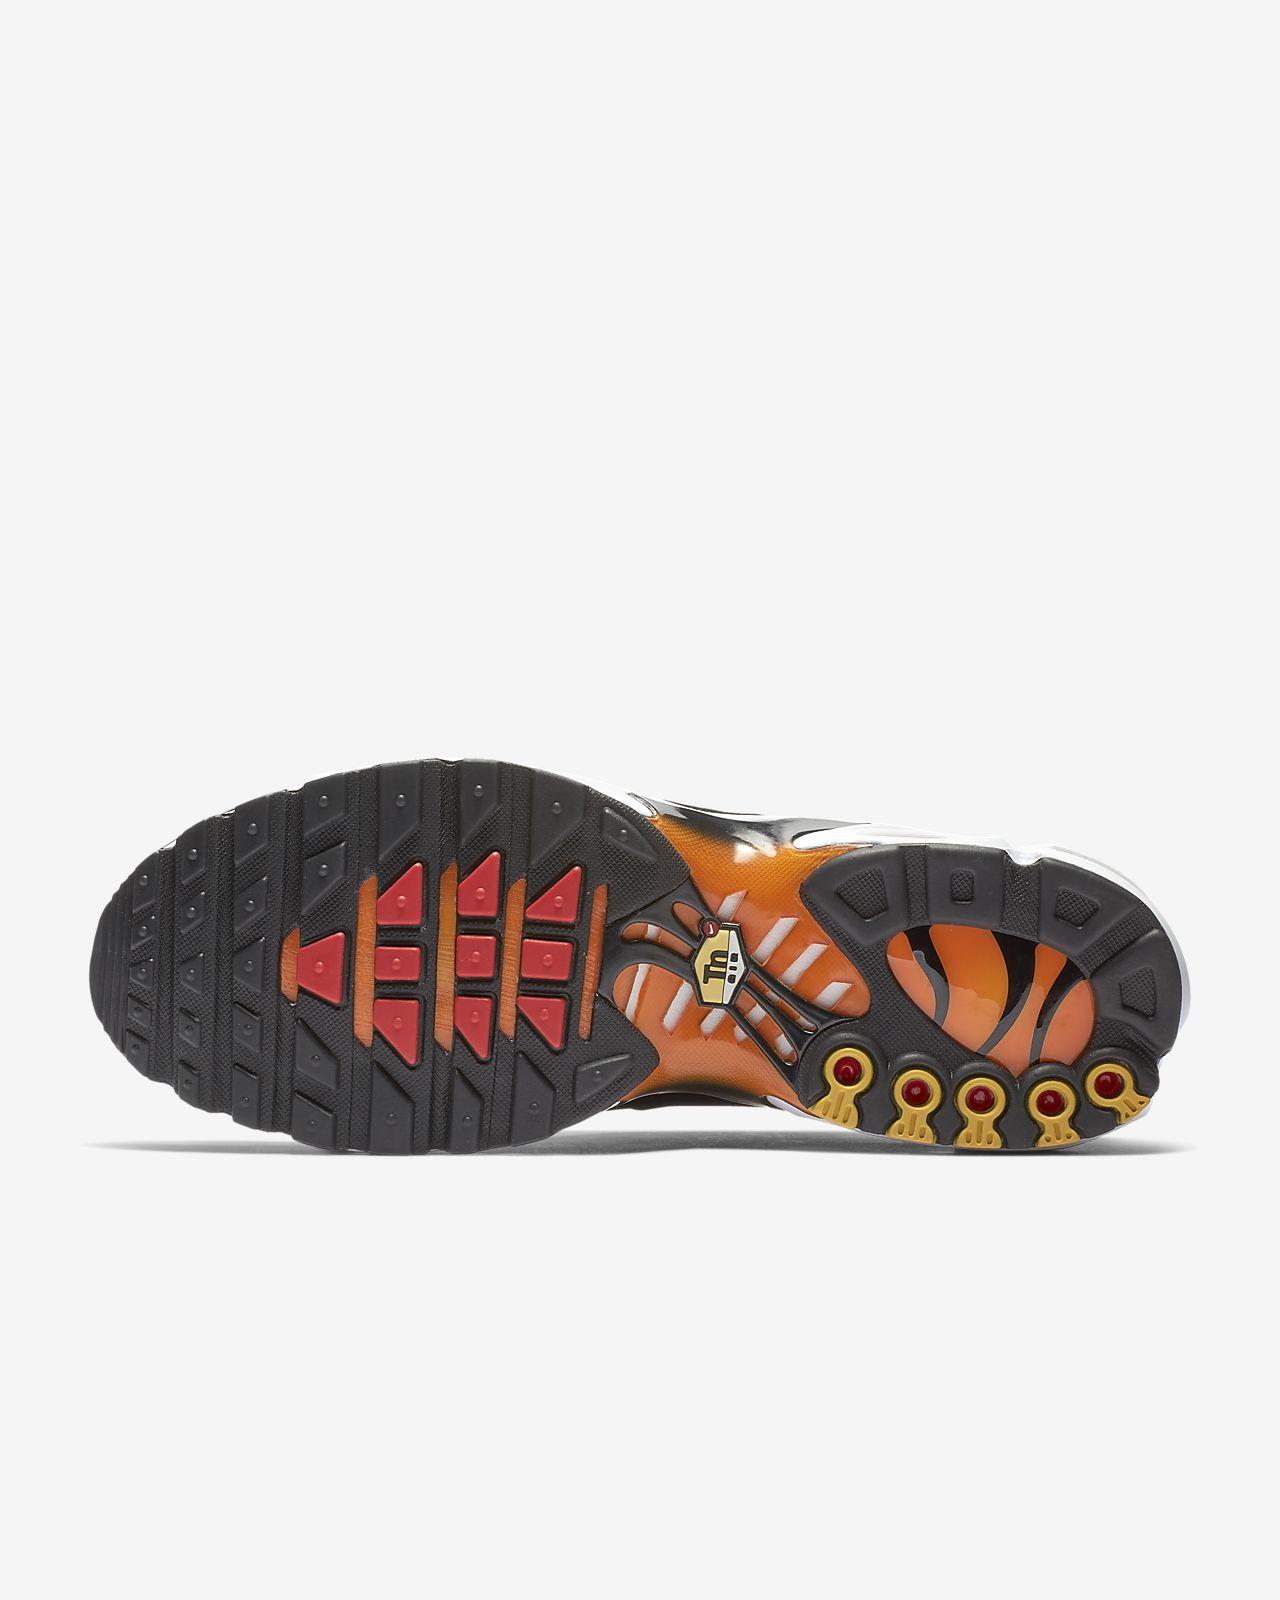 b9241aea011 Nike Air Max Plus OG Shoe. Nike.com GB